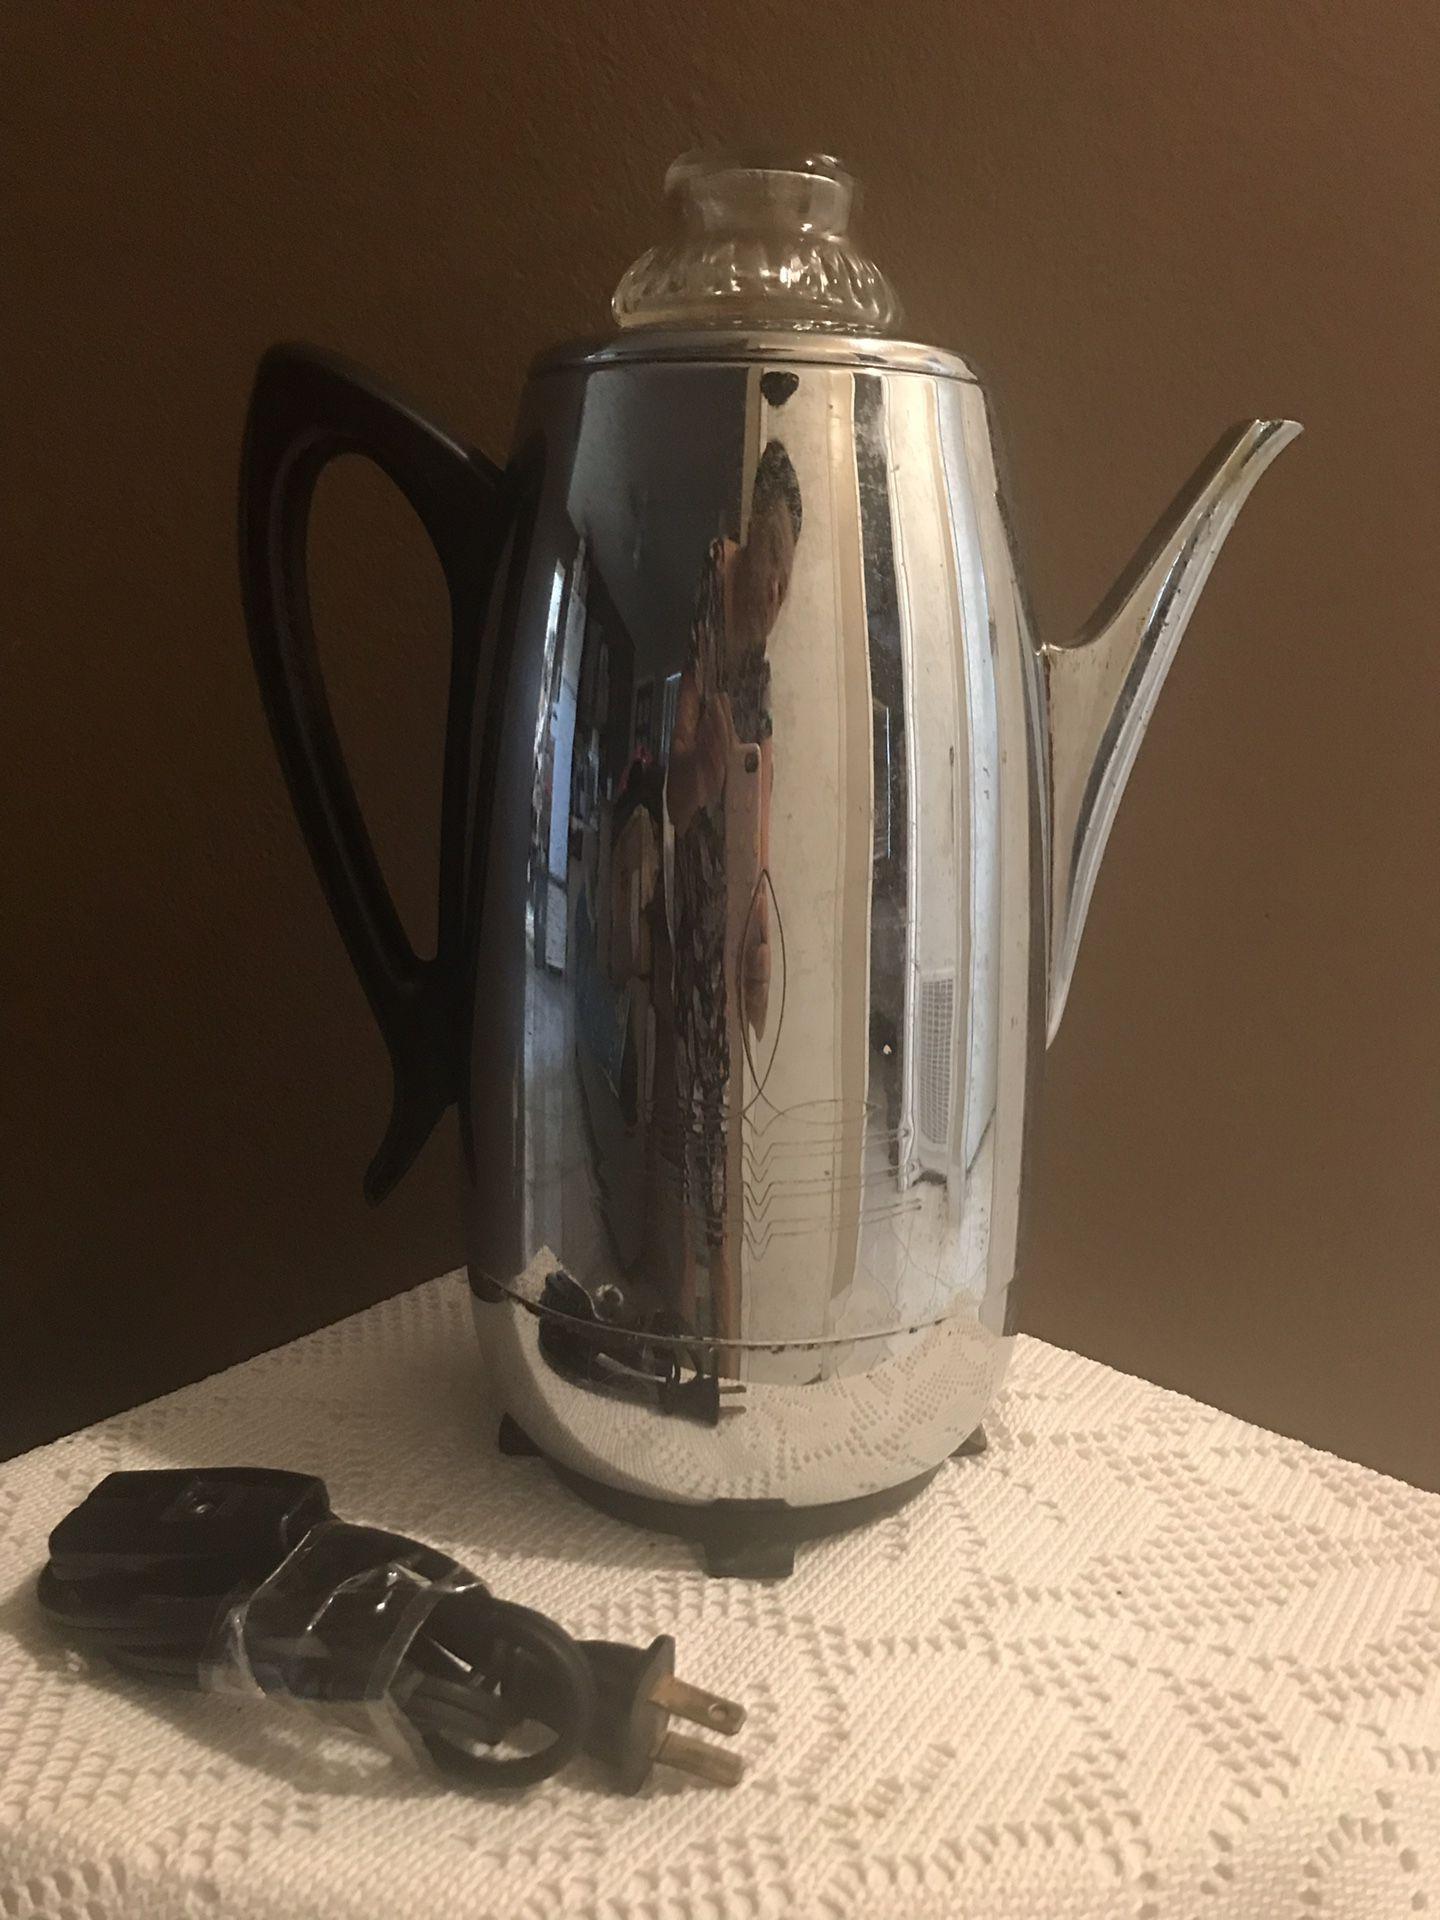 Used coffee maker